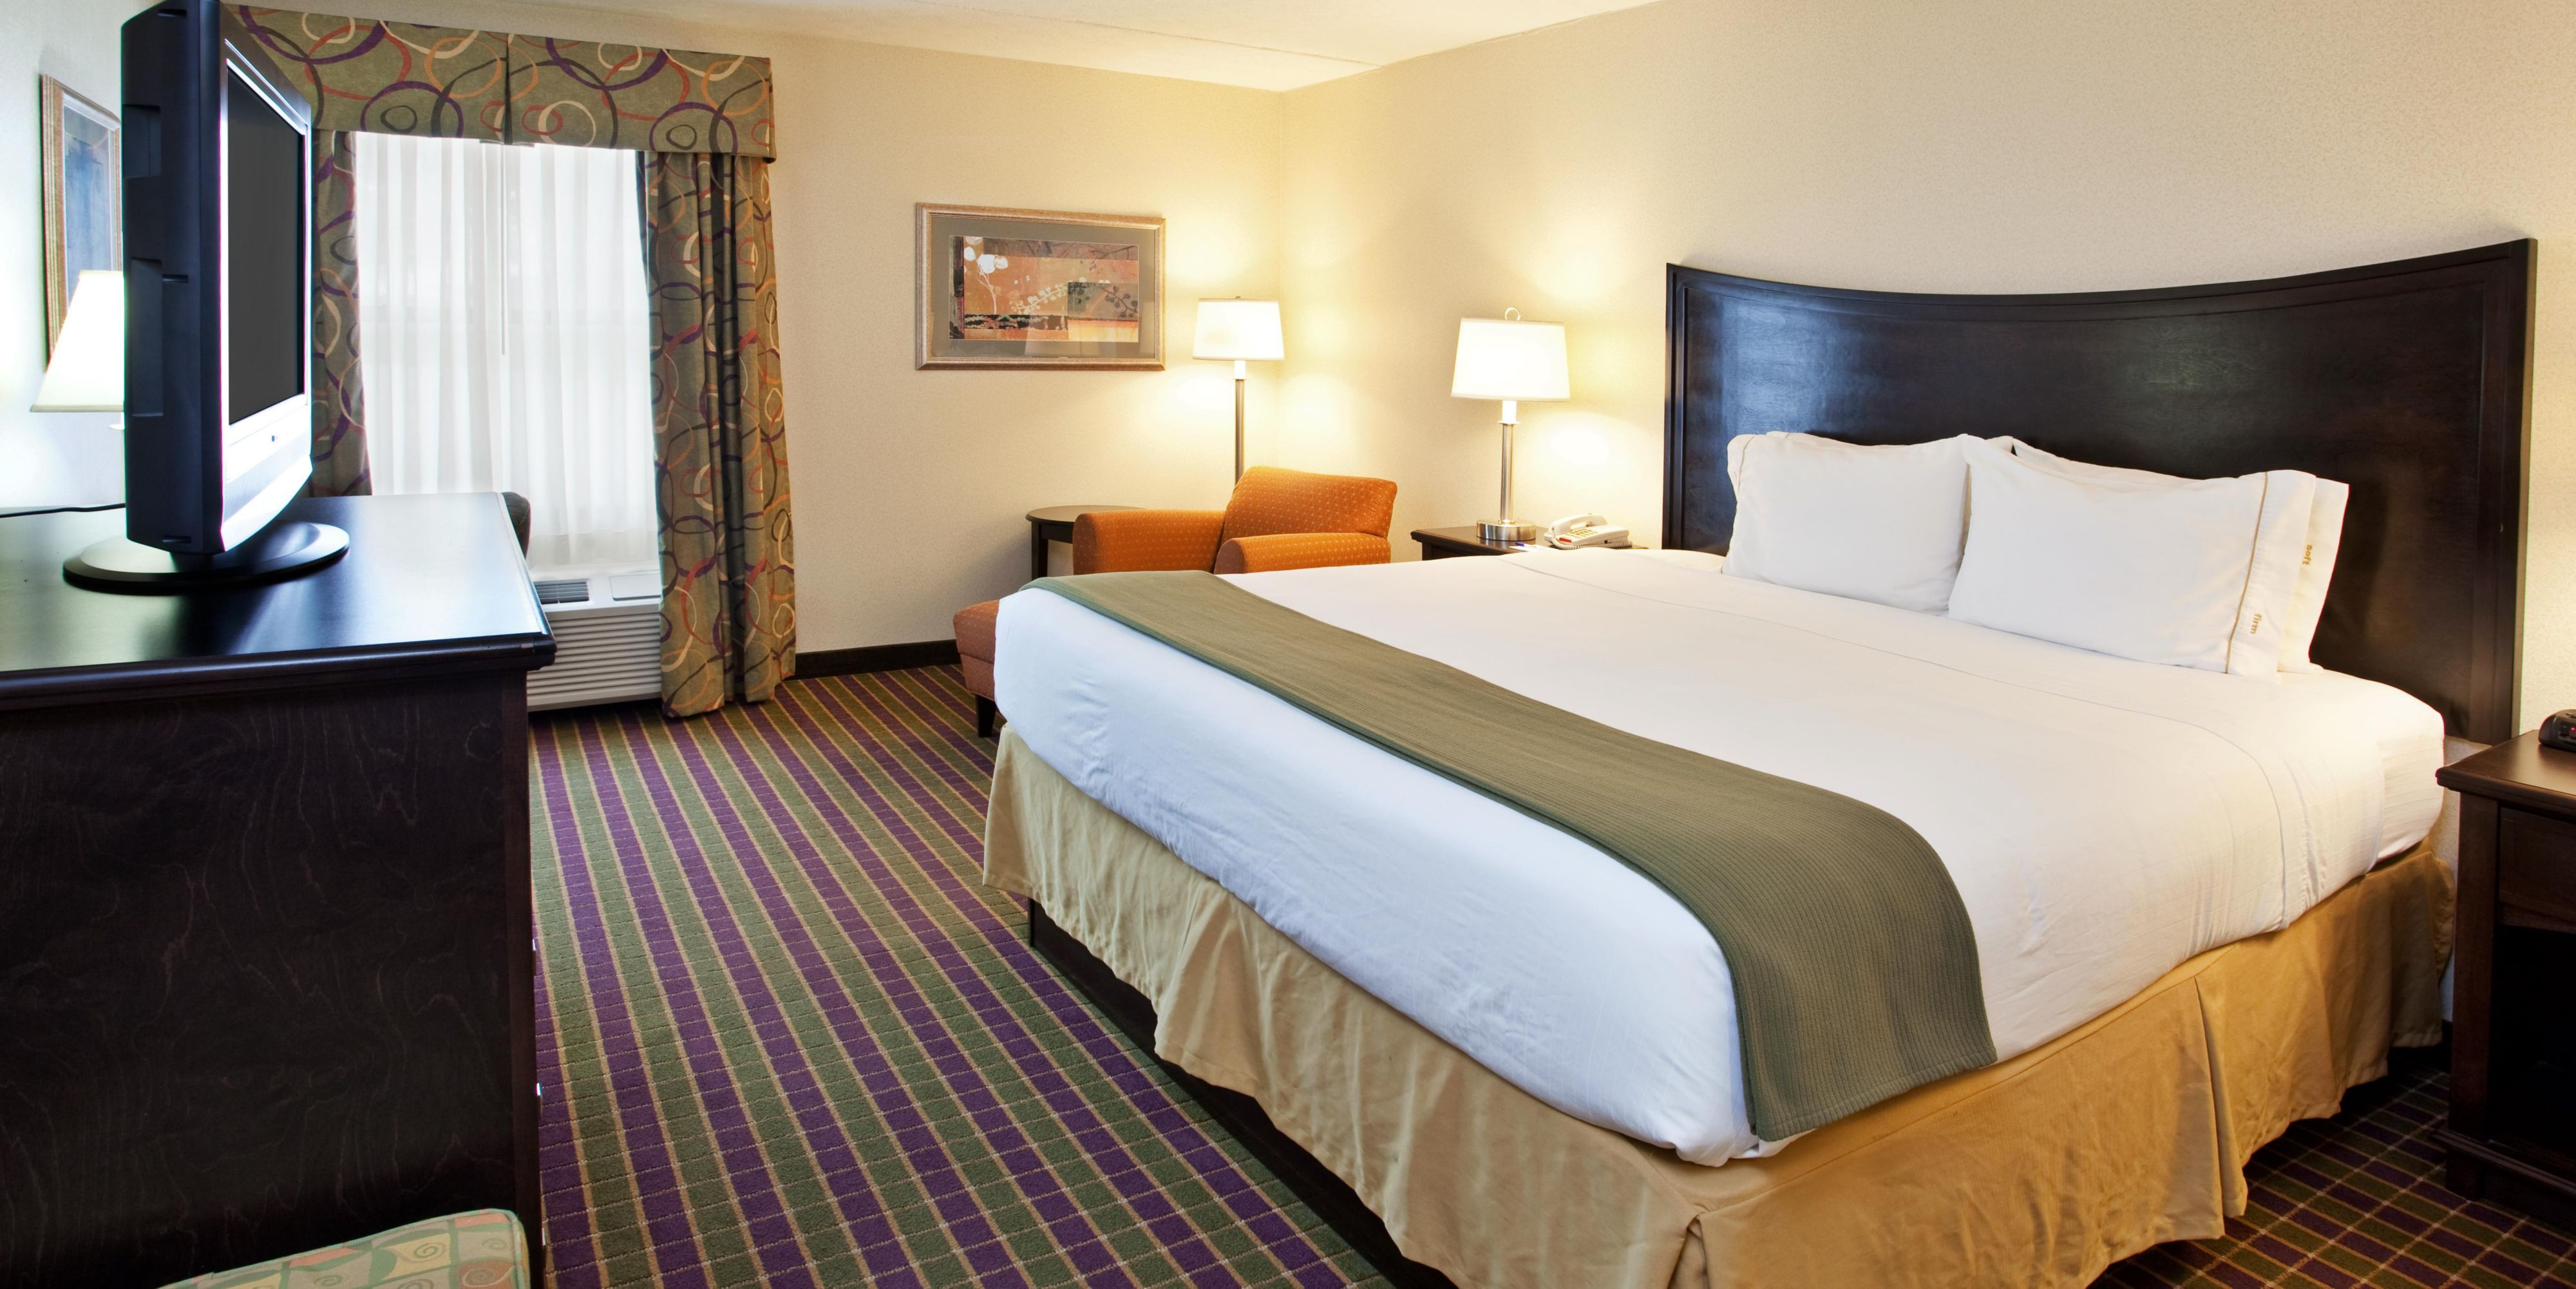 Holiday Inn Express London I 70 Hotel by IHG